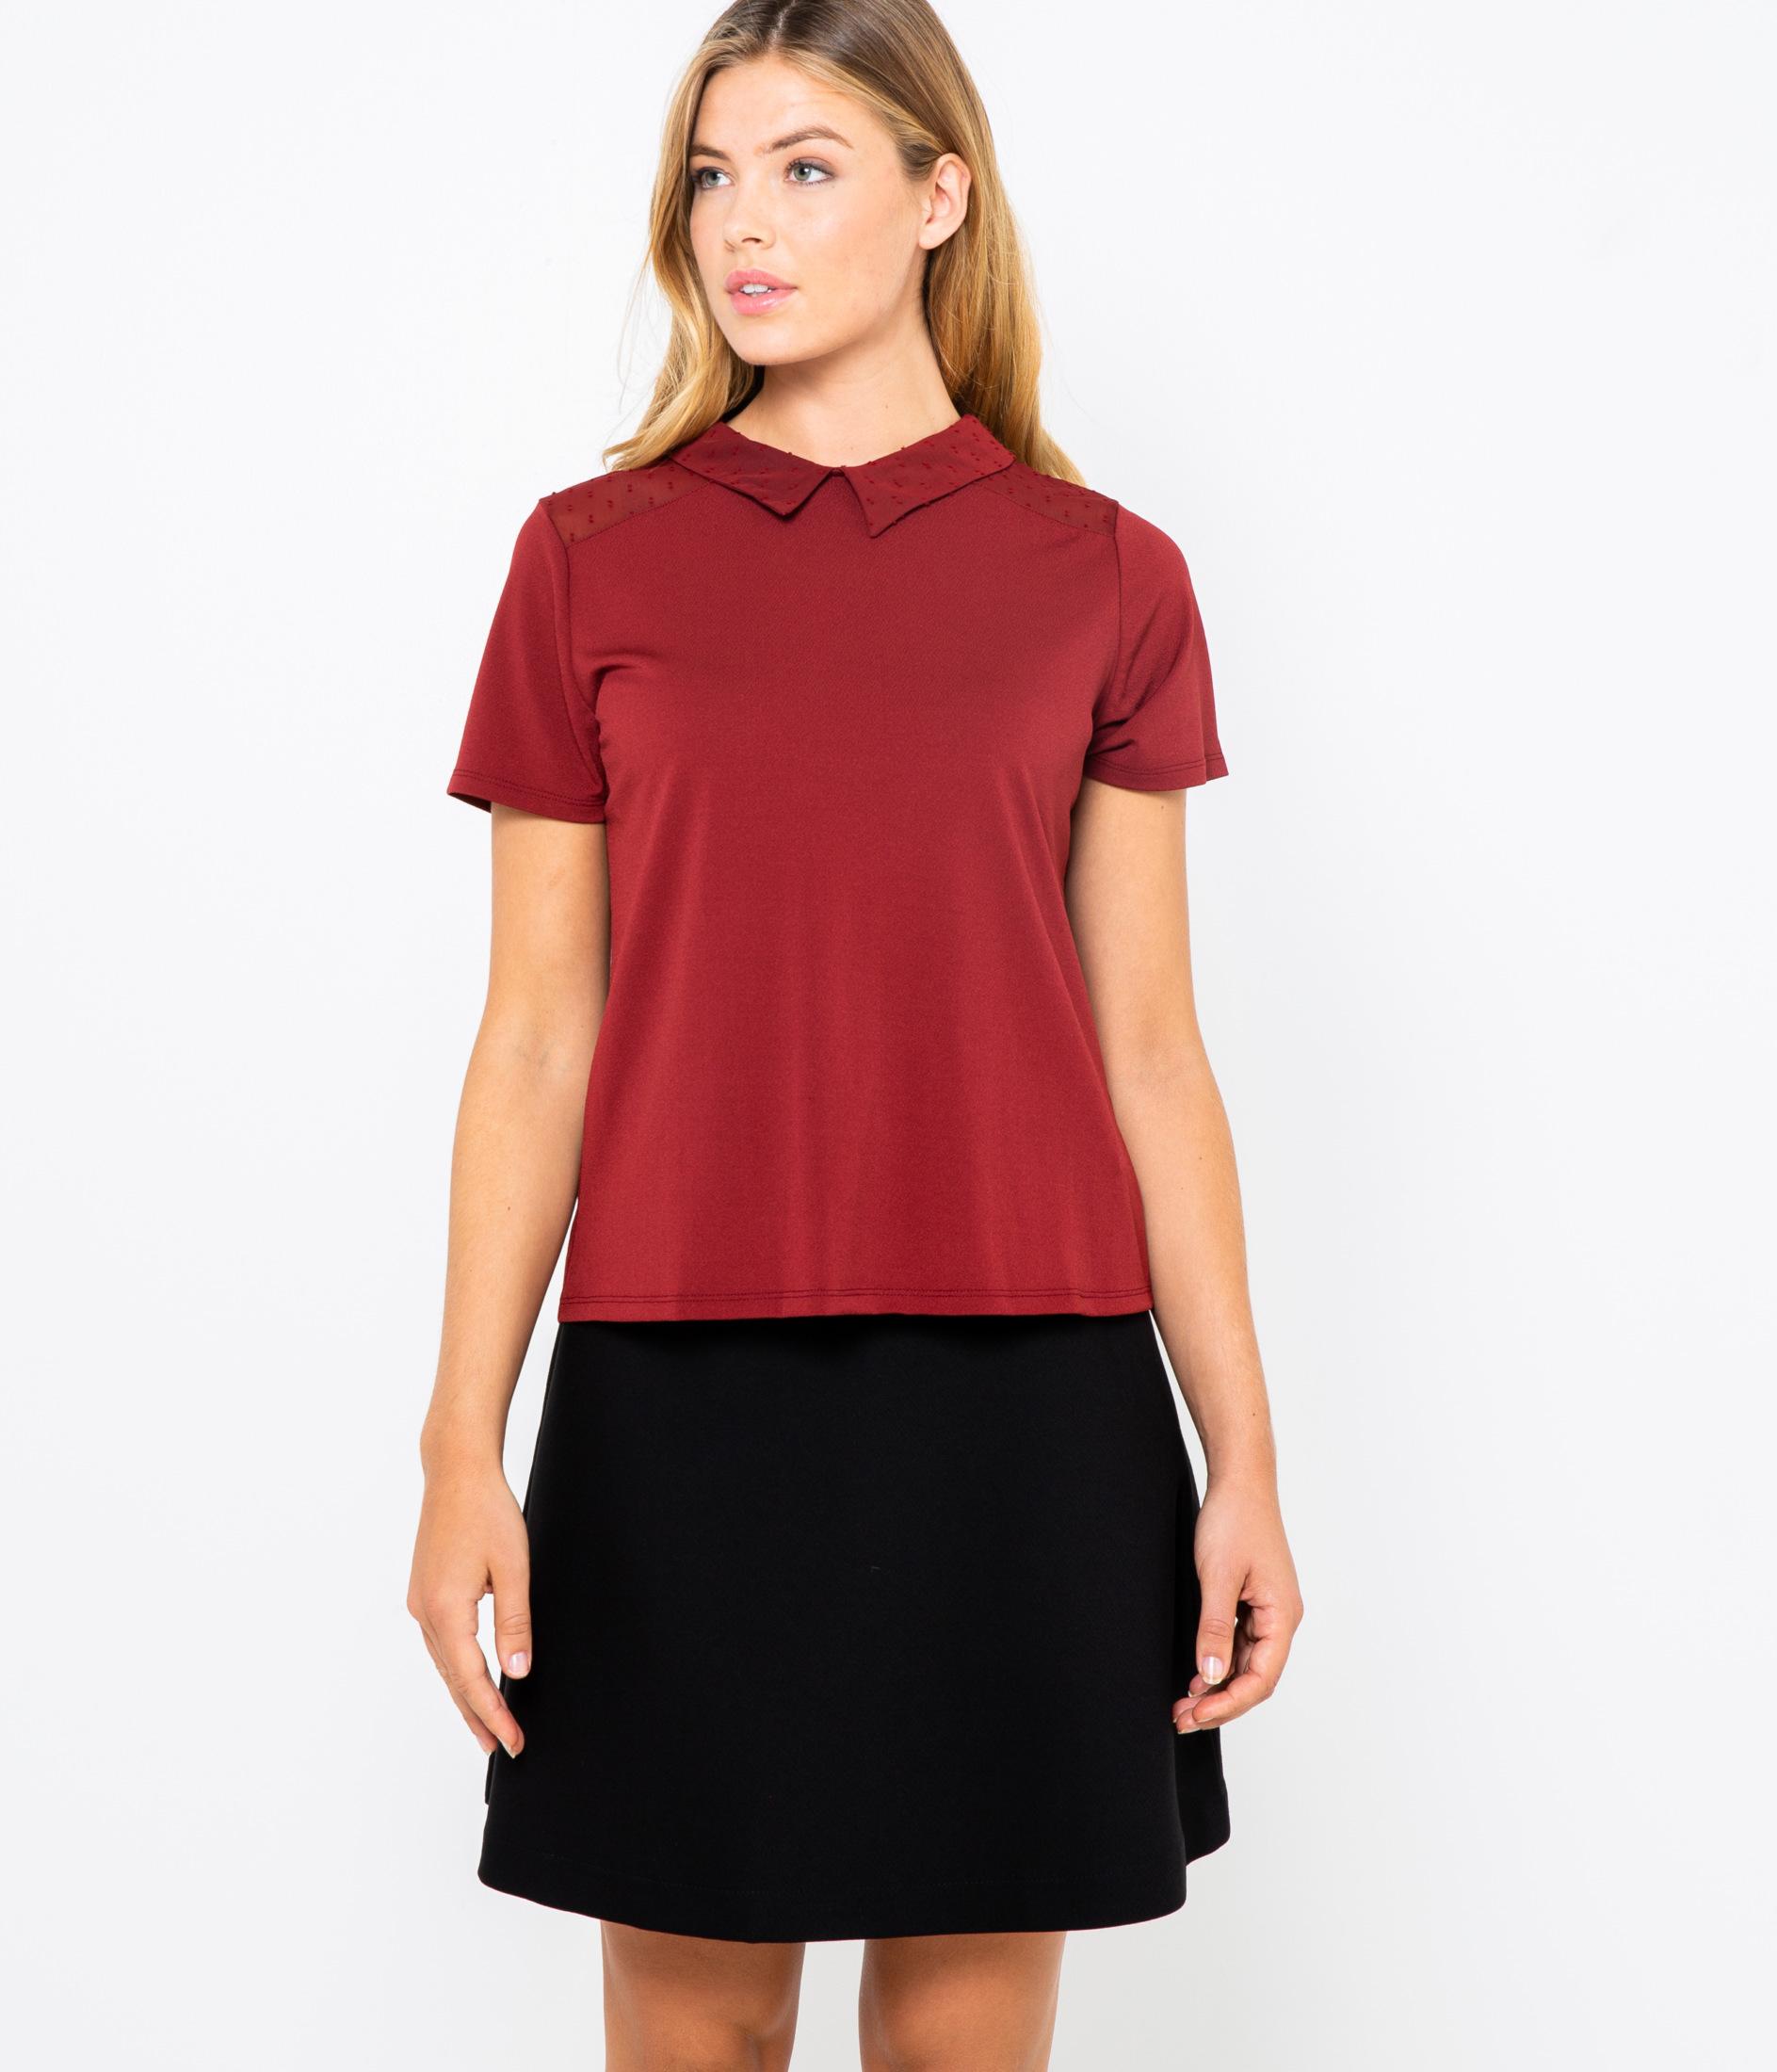 shirt Col Femme Camaïeu T Chemise xBordCe